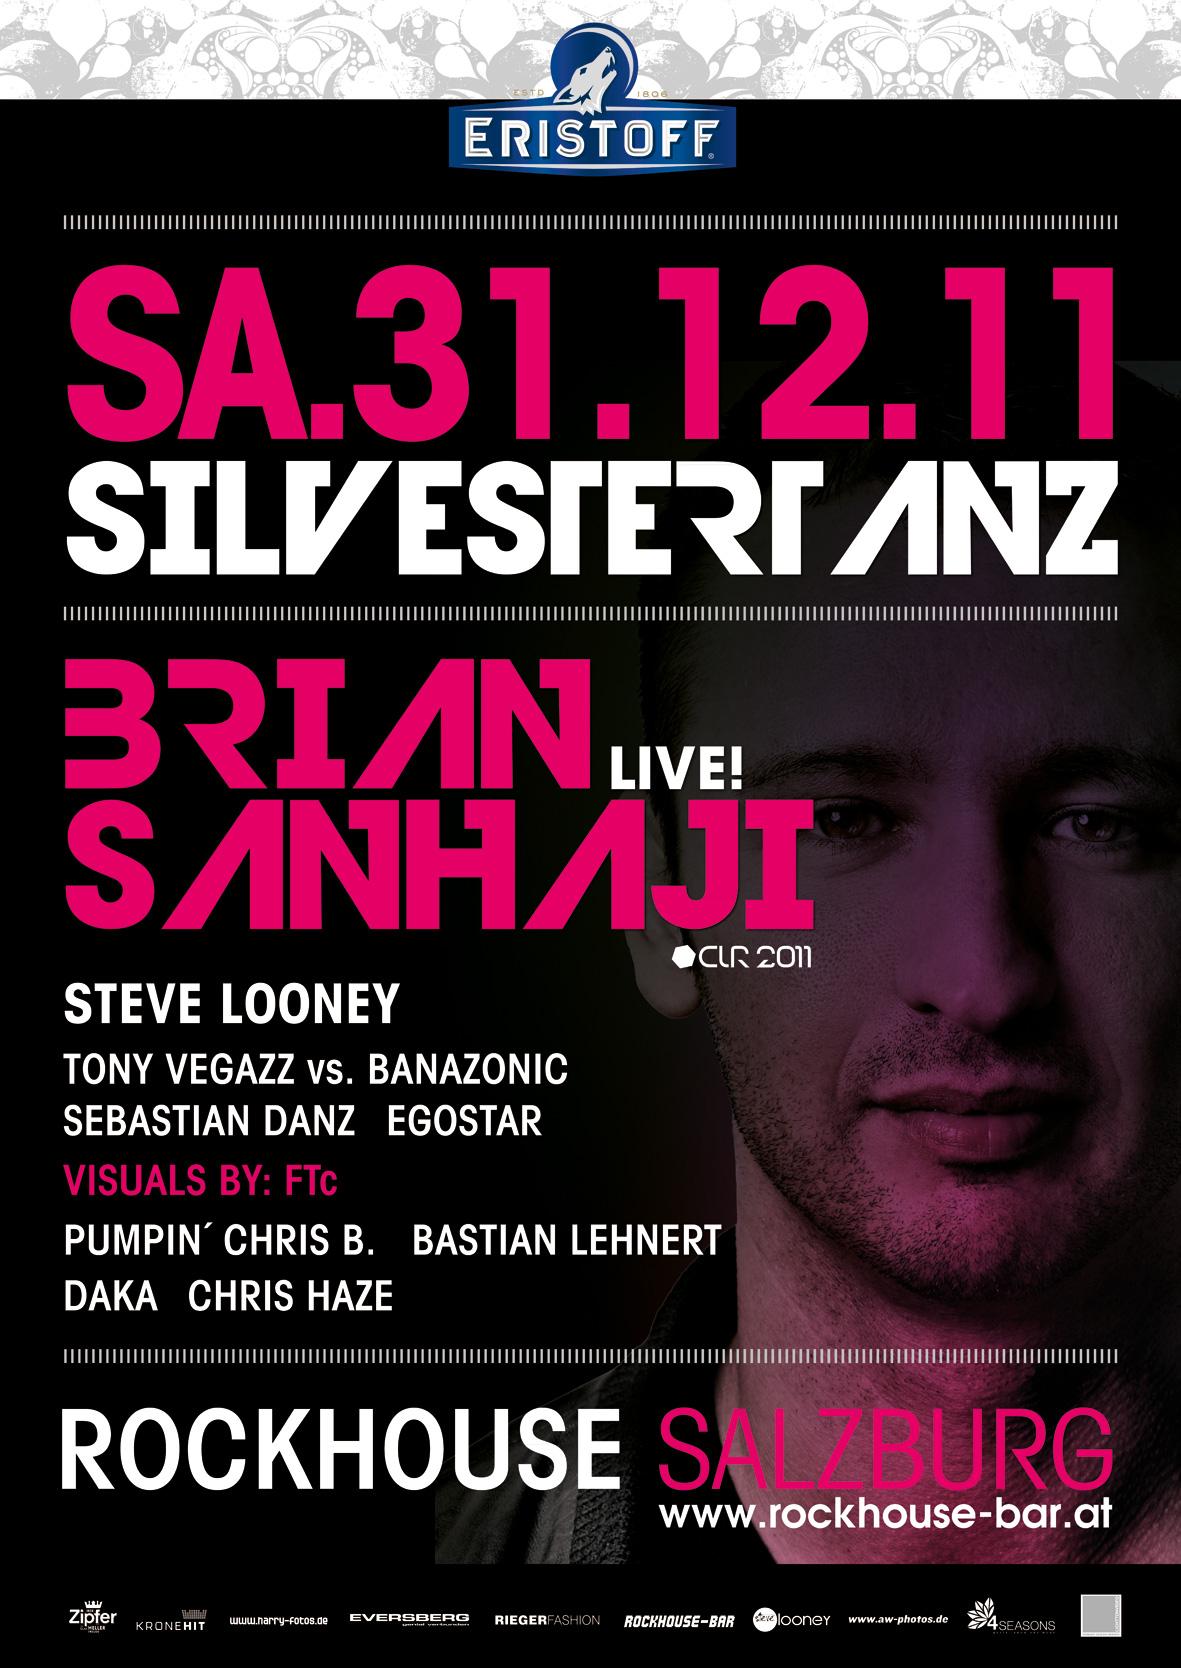 """SILVESTERTANZ"" 31.12.2011 @ ROCKHOUSE Salzburg"